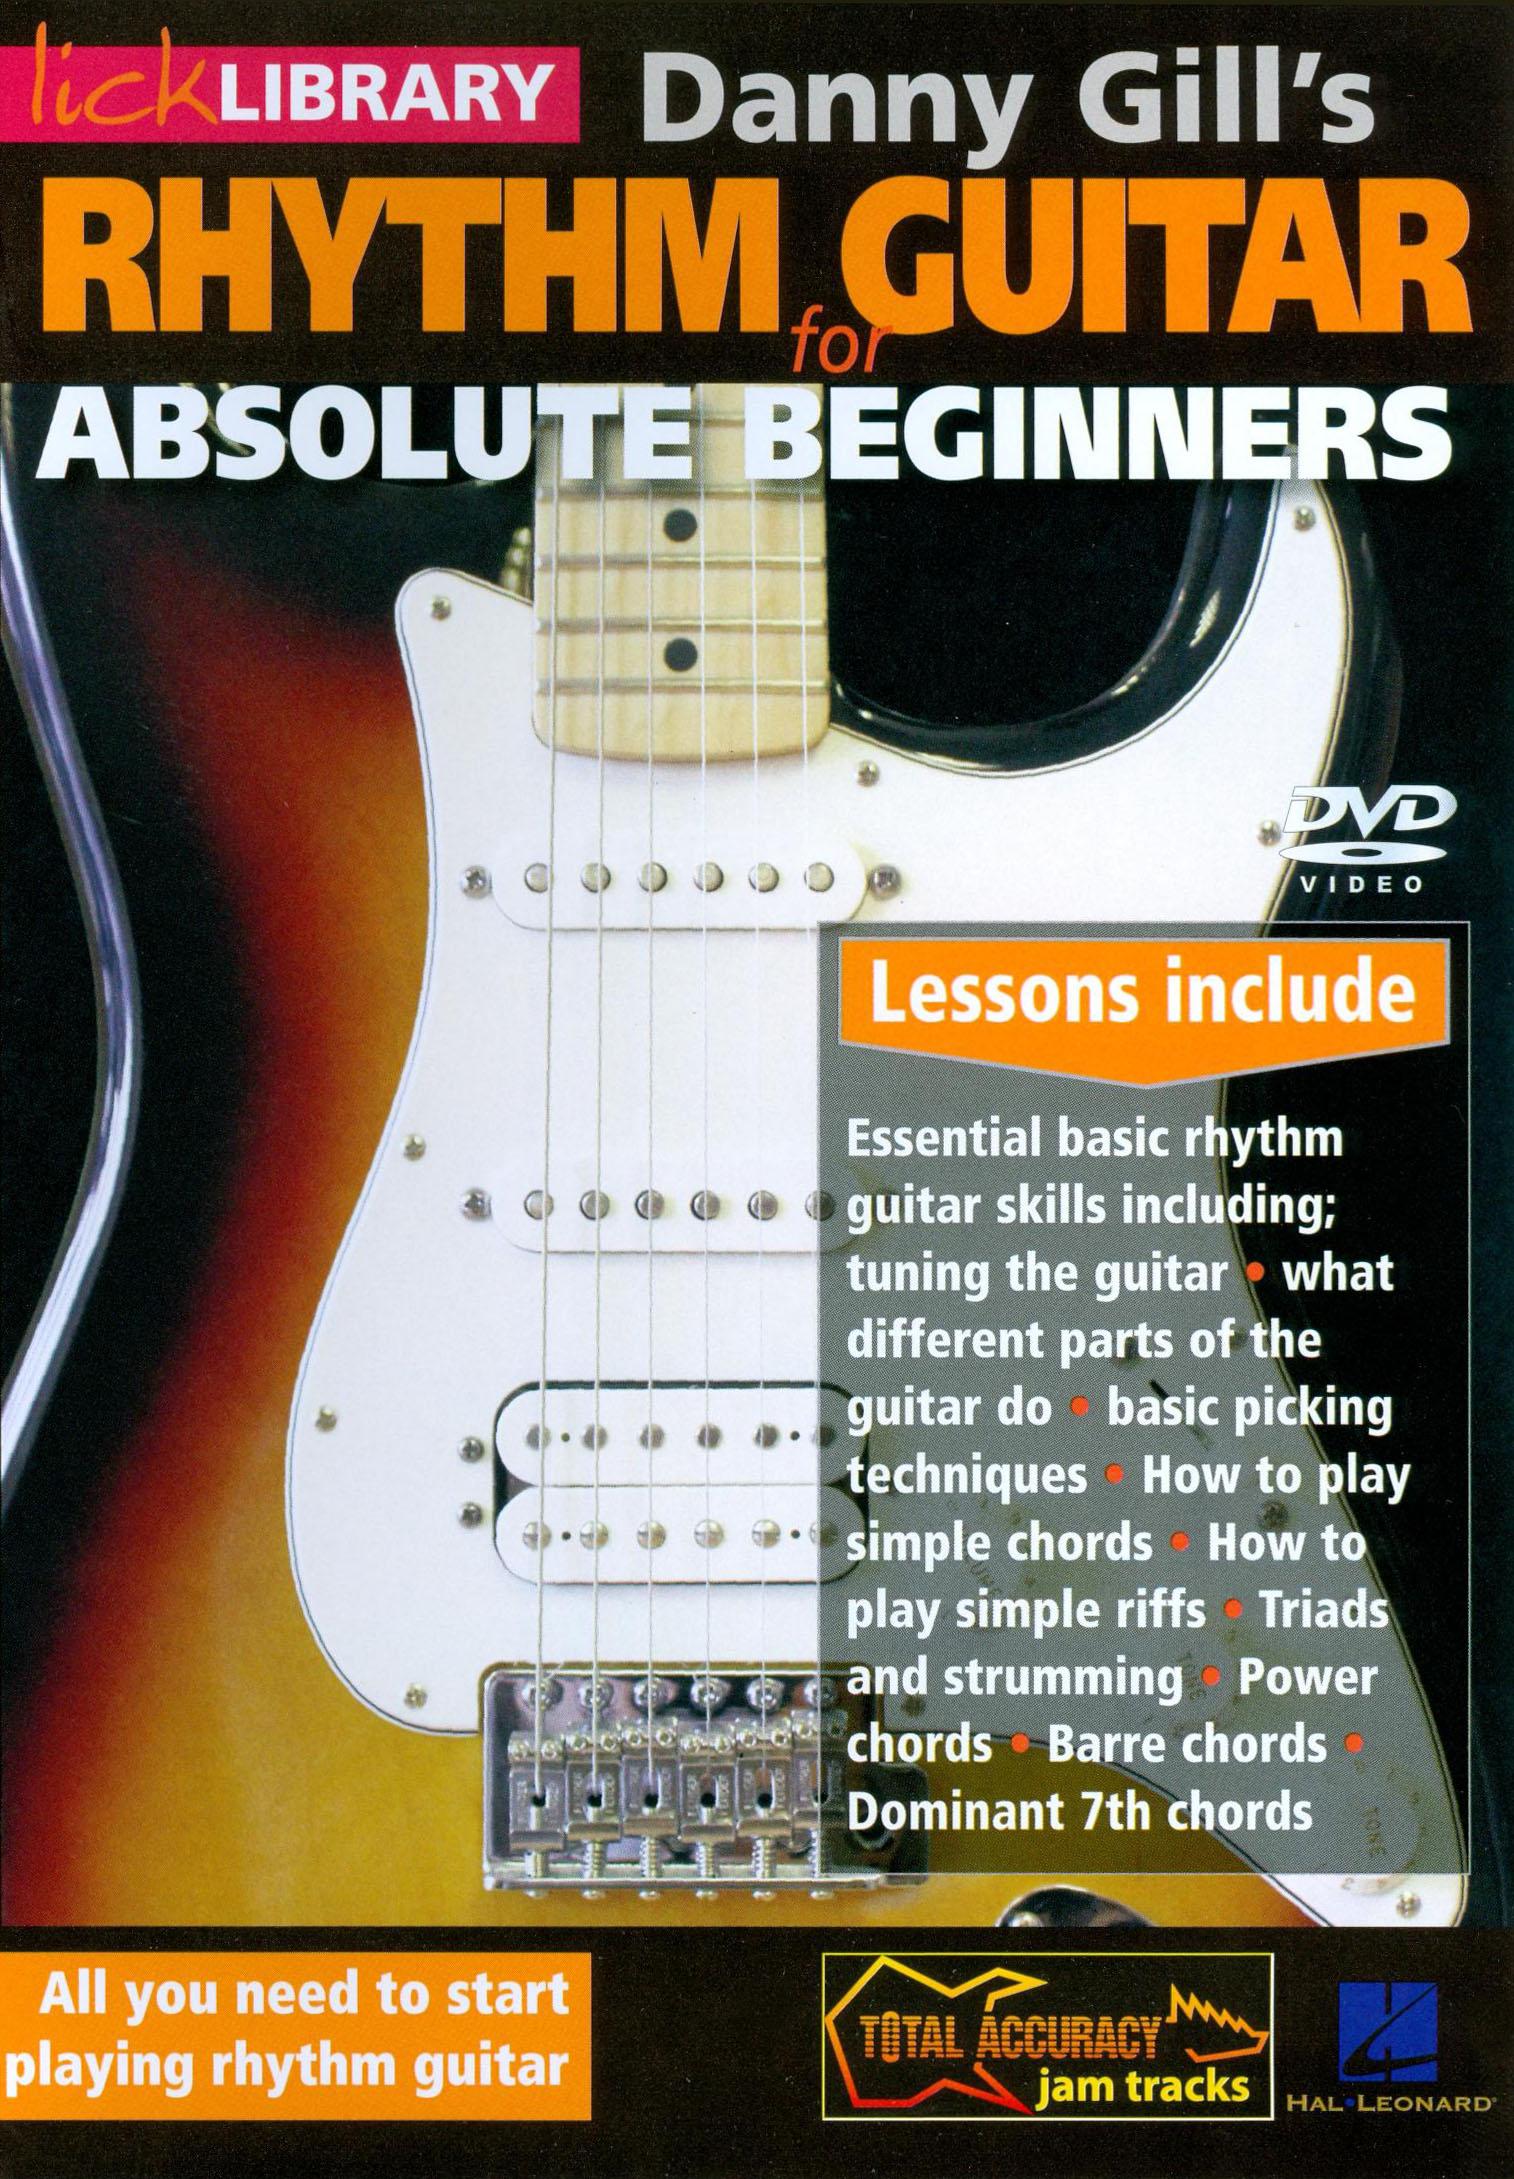 Danny Gill: Rhythm Guitar for Absolute Beginners